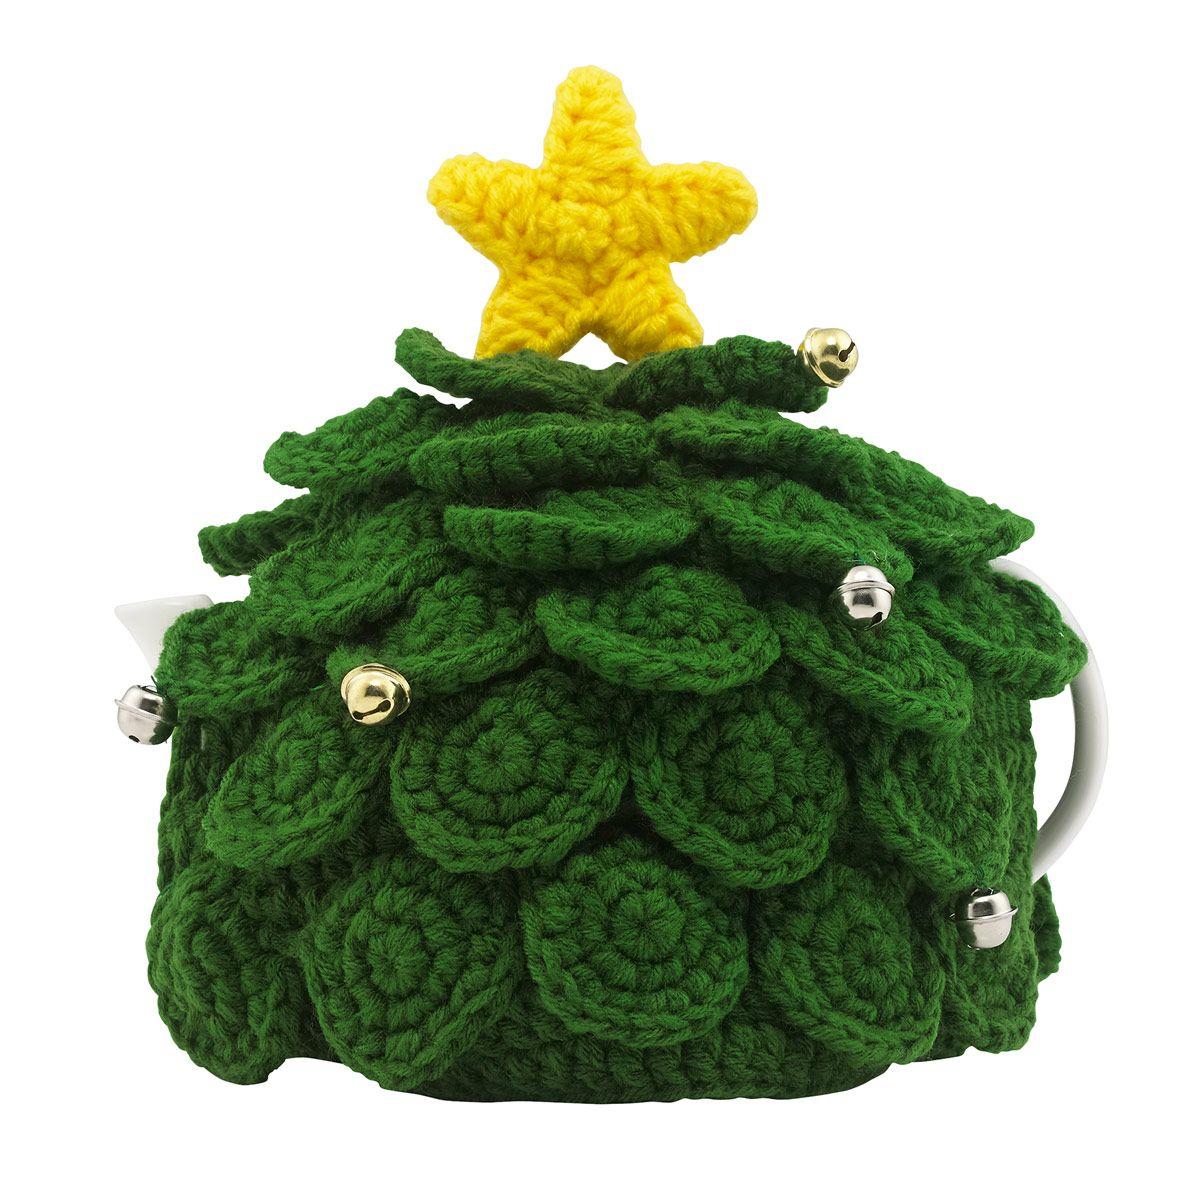 Crochet Christmas Tree Tea Cosy Christmas Decorations Cathkidston Christmas Crochet Patterns Crochet Tea Cozy Christmas Crochet